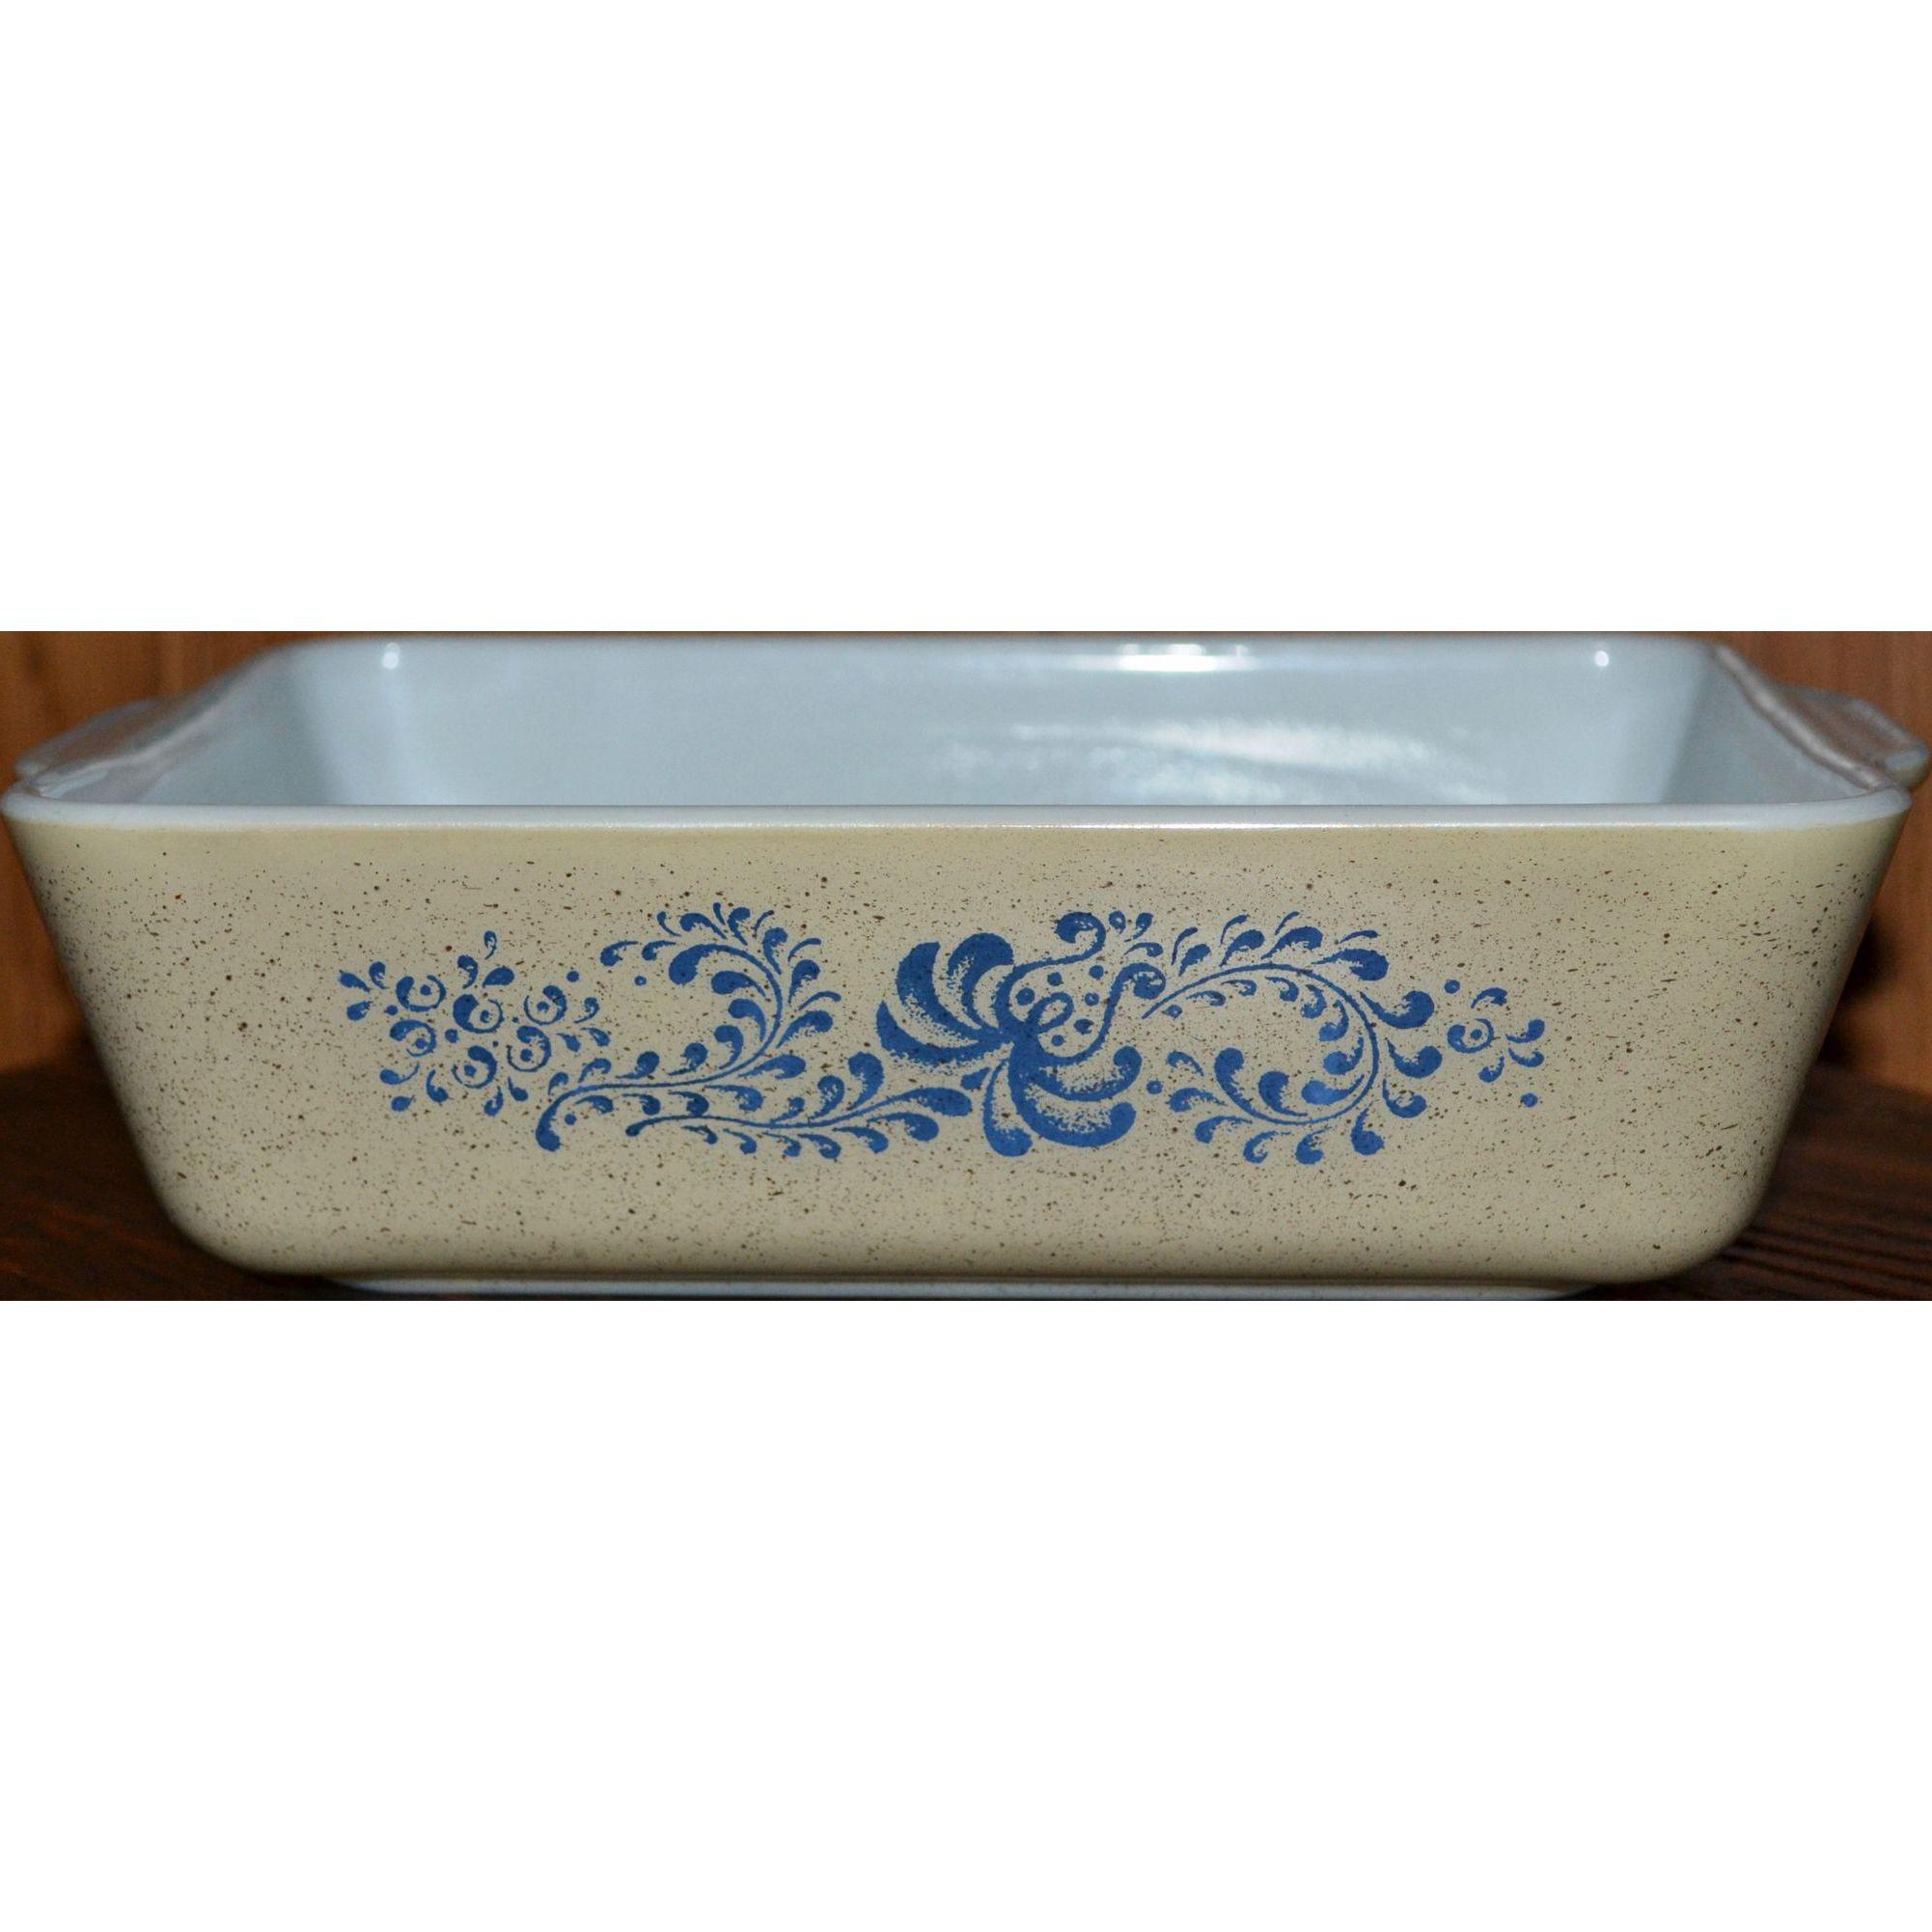 Pyrex Homestead Pattern 1.5 Quart Blue Flower Refrigerator Dish #503B